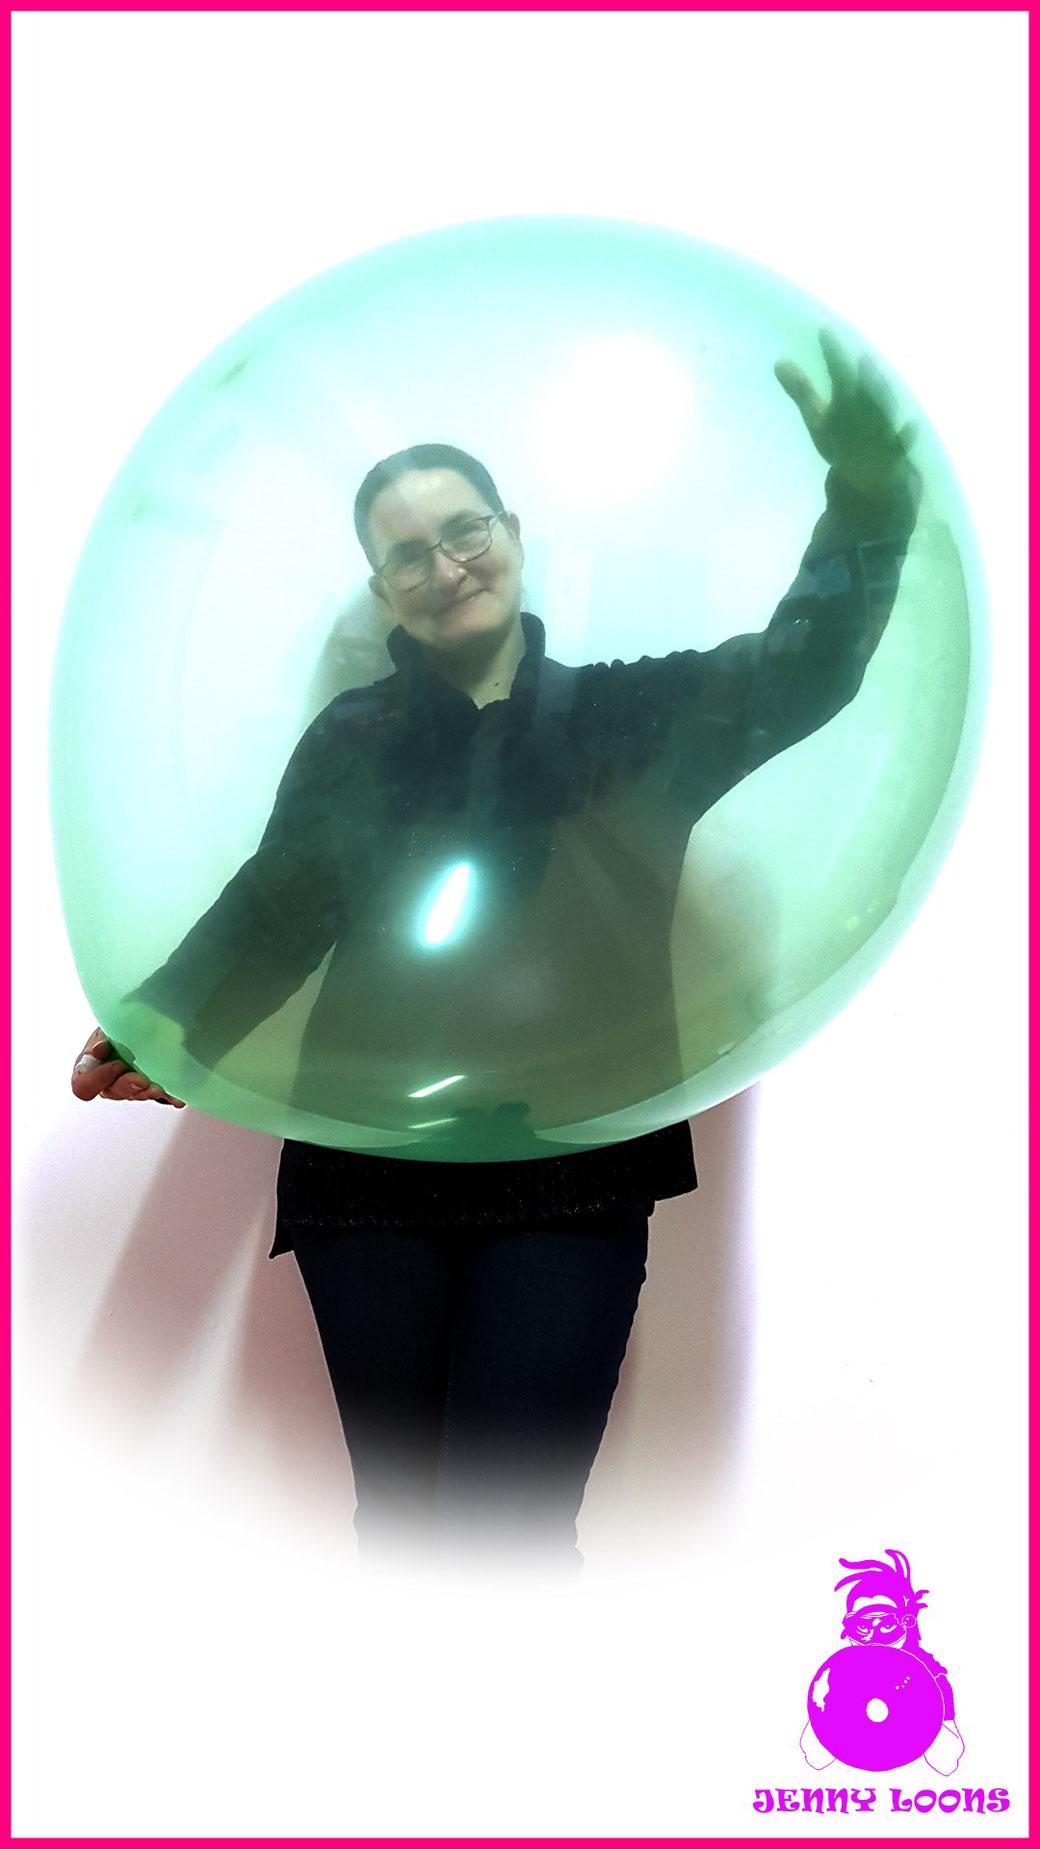 Belbal Soap Crystal B250 grey grau 040 red rot 041 blue blau 042 purple lila 043 pink fuchsia 044 green grün 045 yellow gelb 046 orange 047 Riesenballon Giant balloon